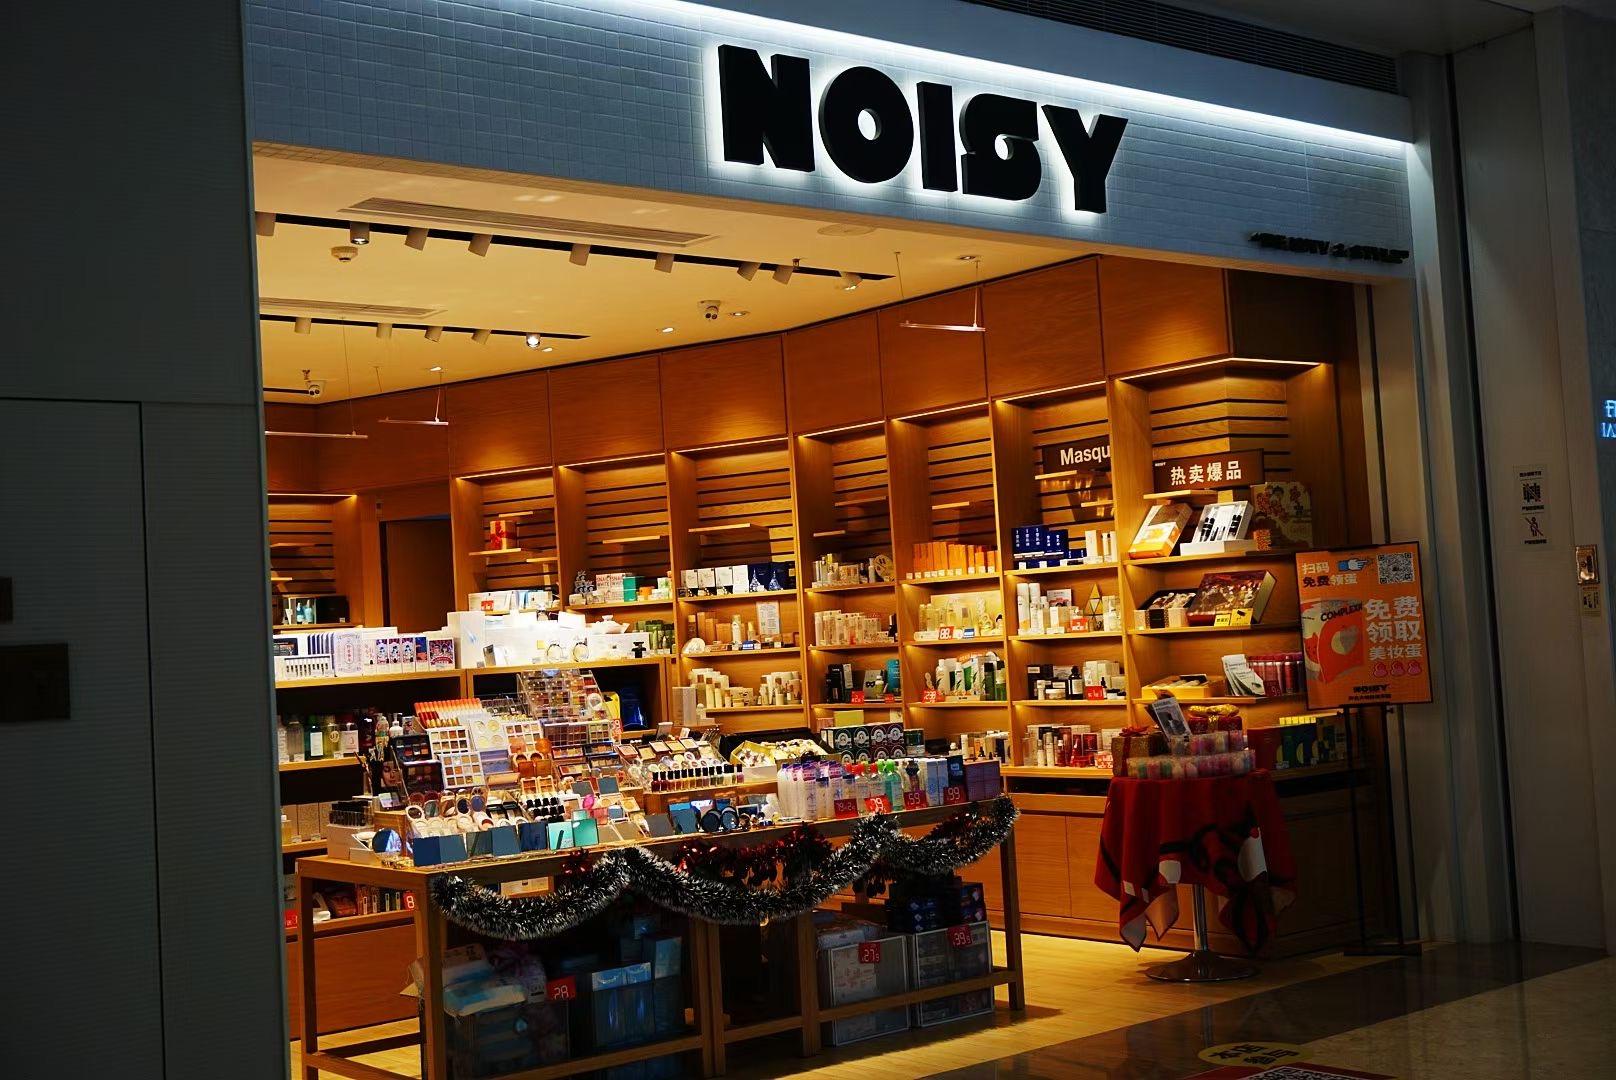 Puppy Salon帕比沙龙正式登陆NOISY